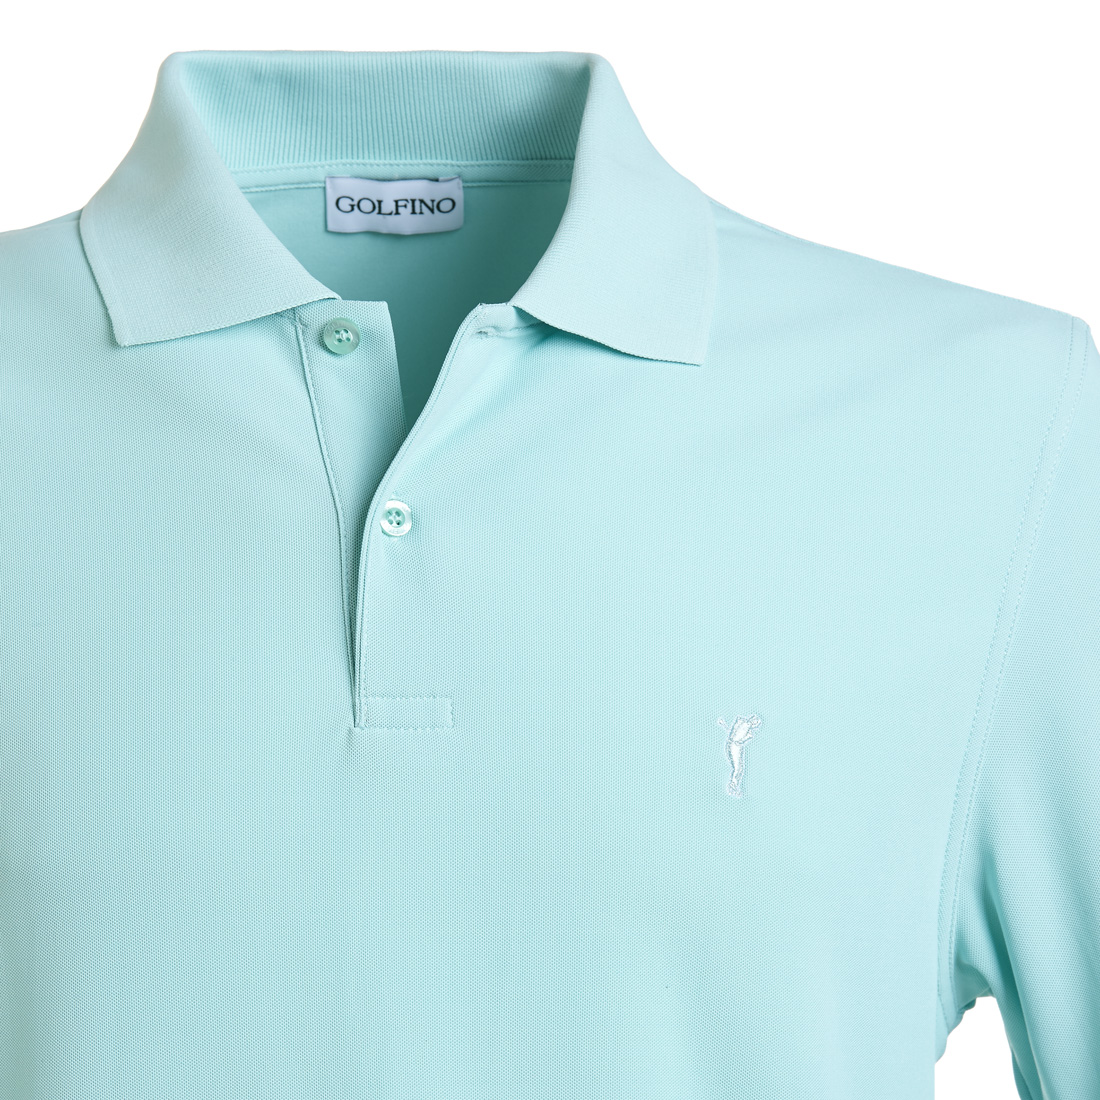 Kurzarm Golfpiqué mit Moisture-Management unifarben